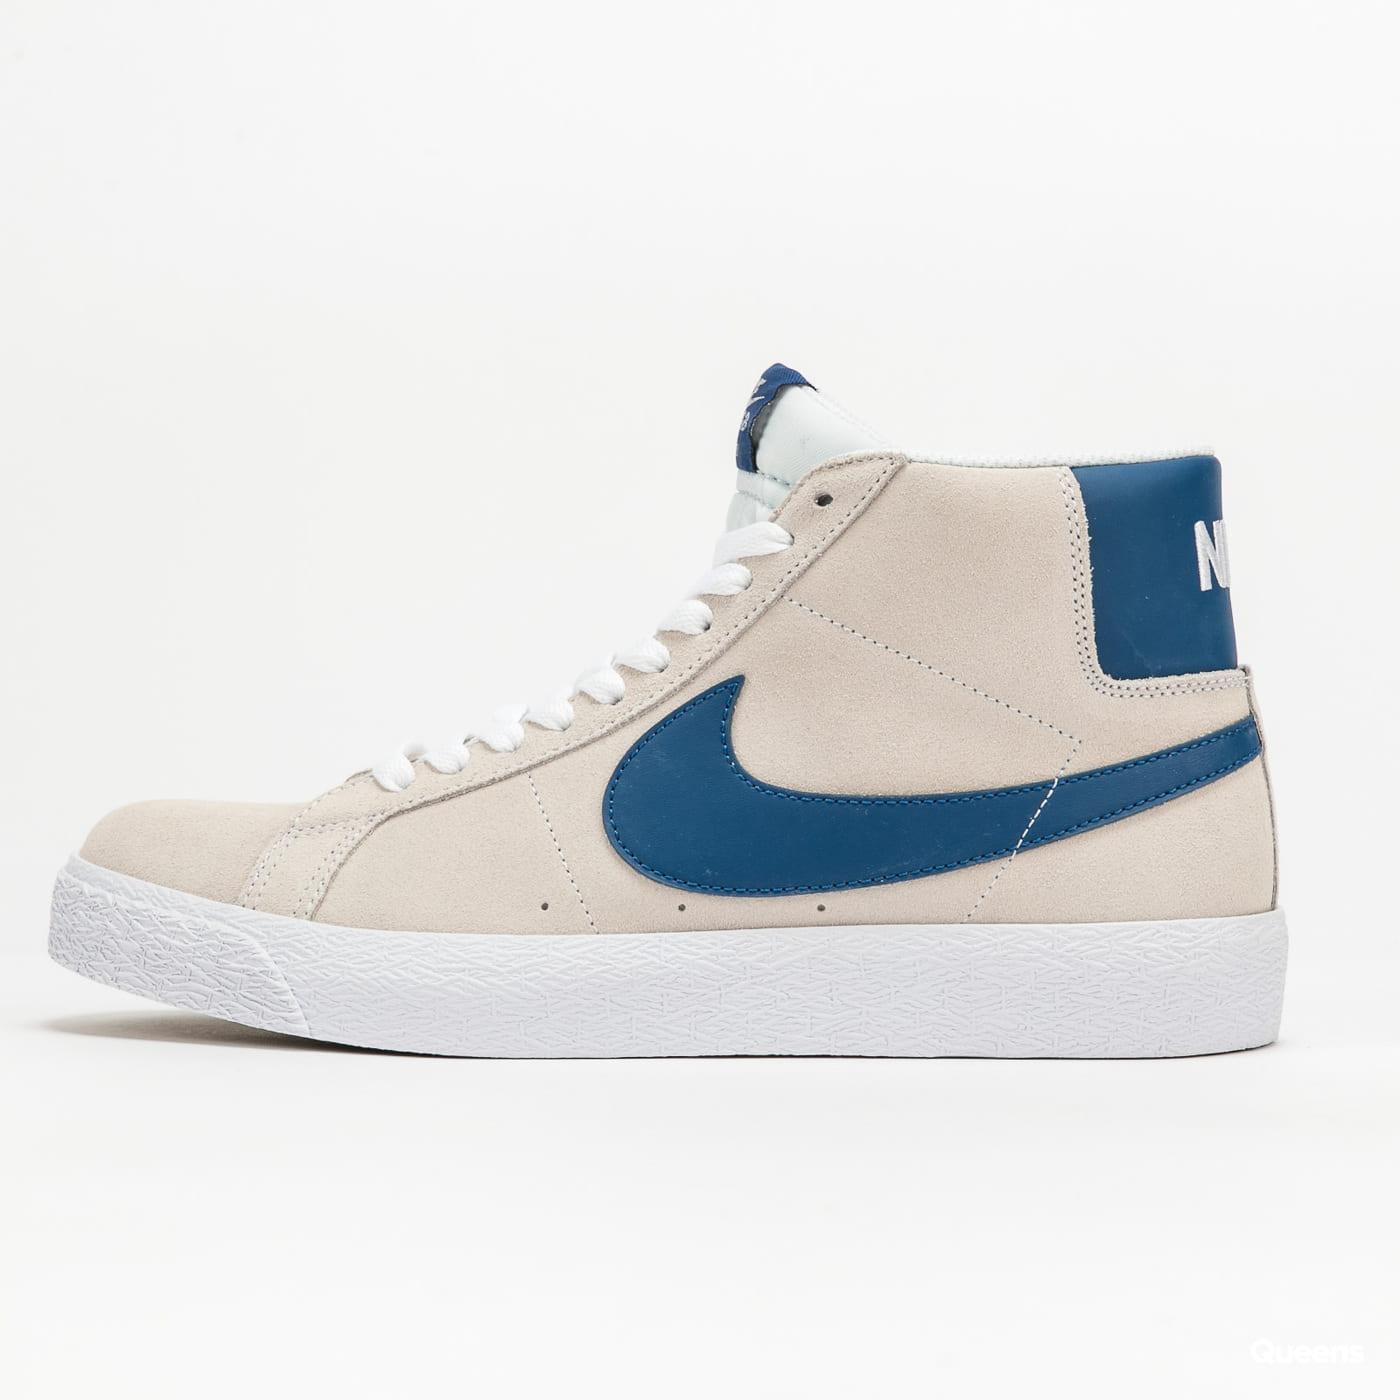 Nike SB Zoom Blazer Mid white / court blue - white - white